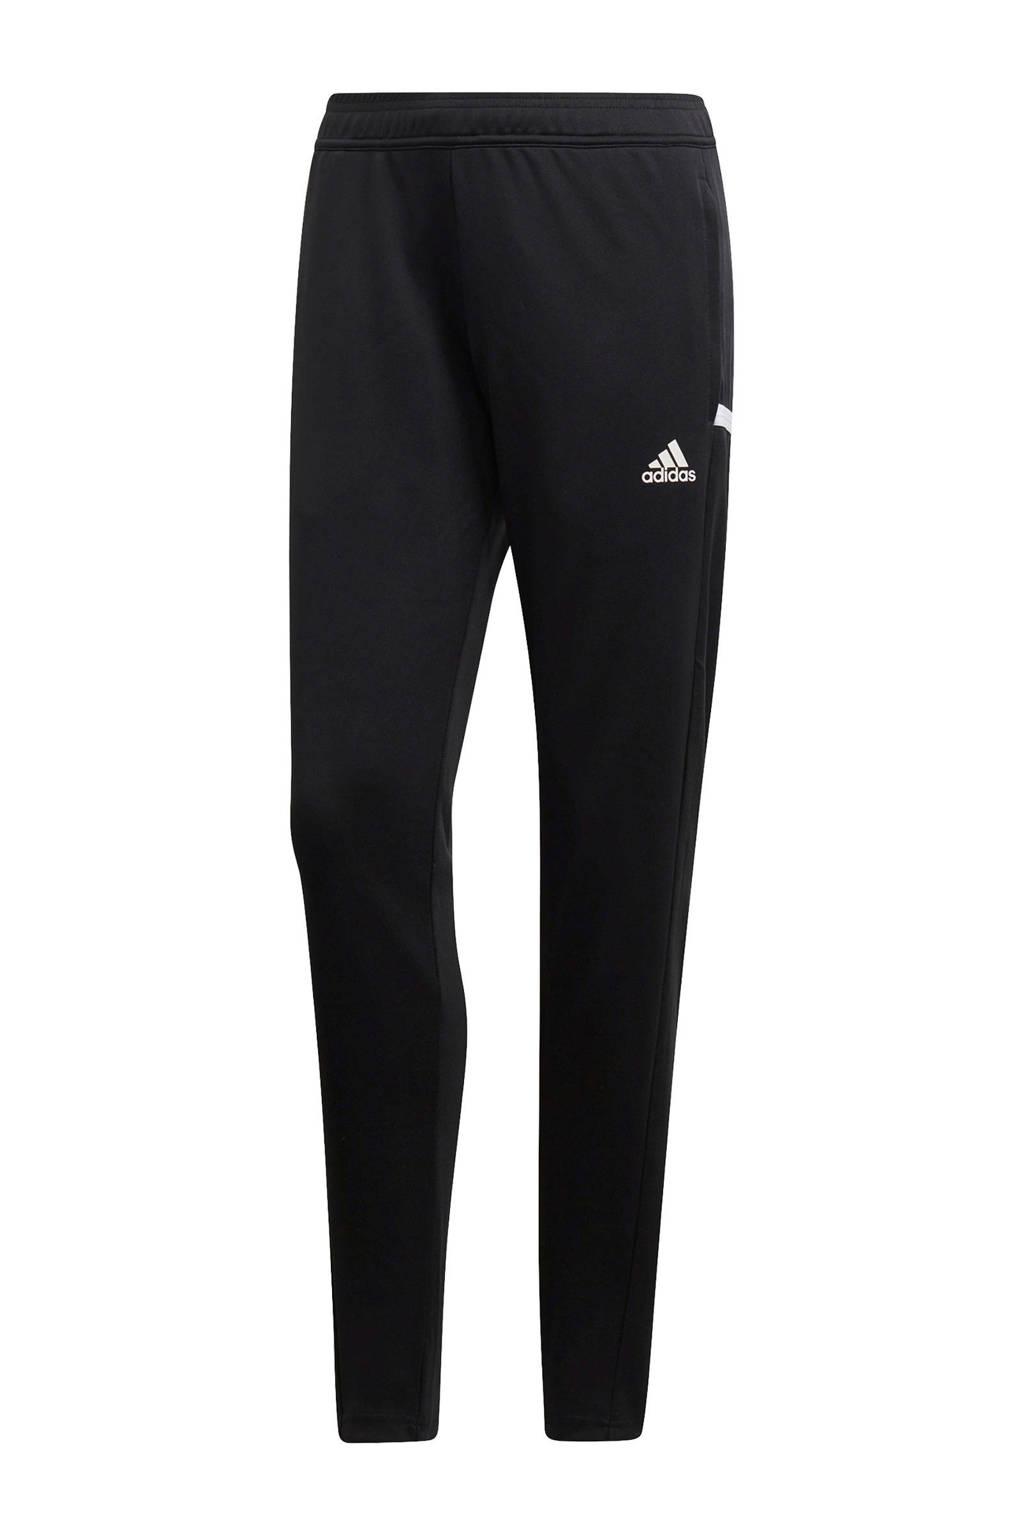 adidas Performance trainingsbroek T19 zwart, Zwart/wit